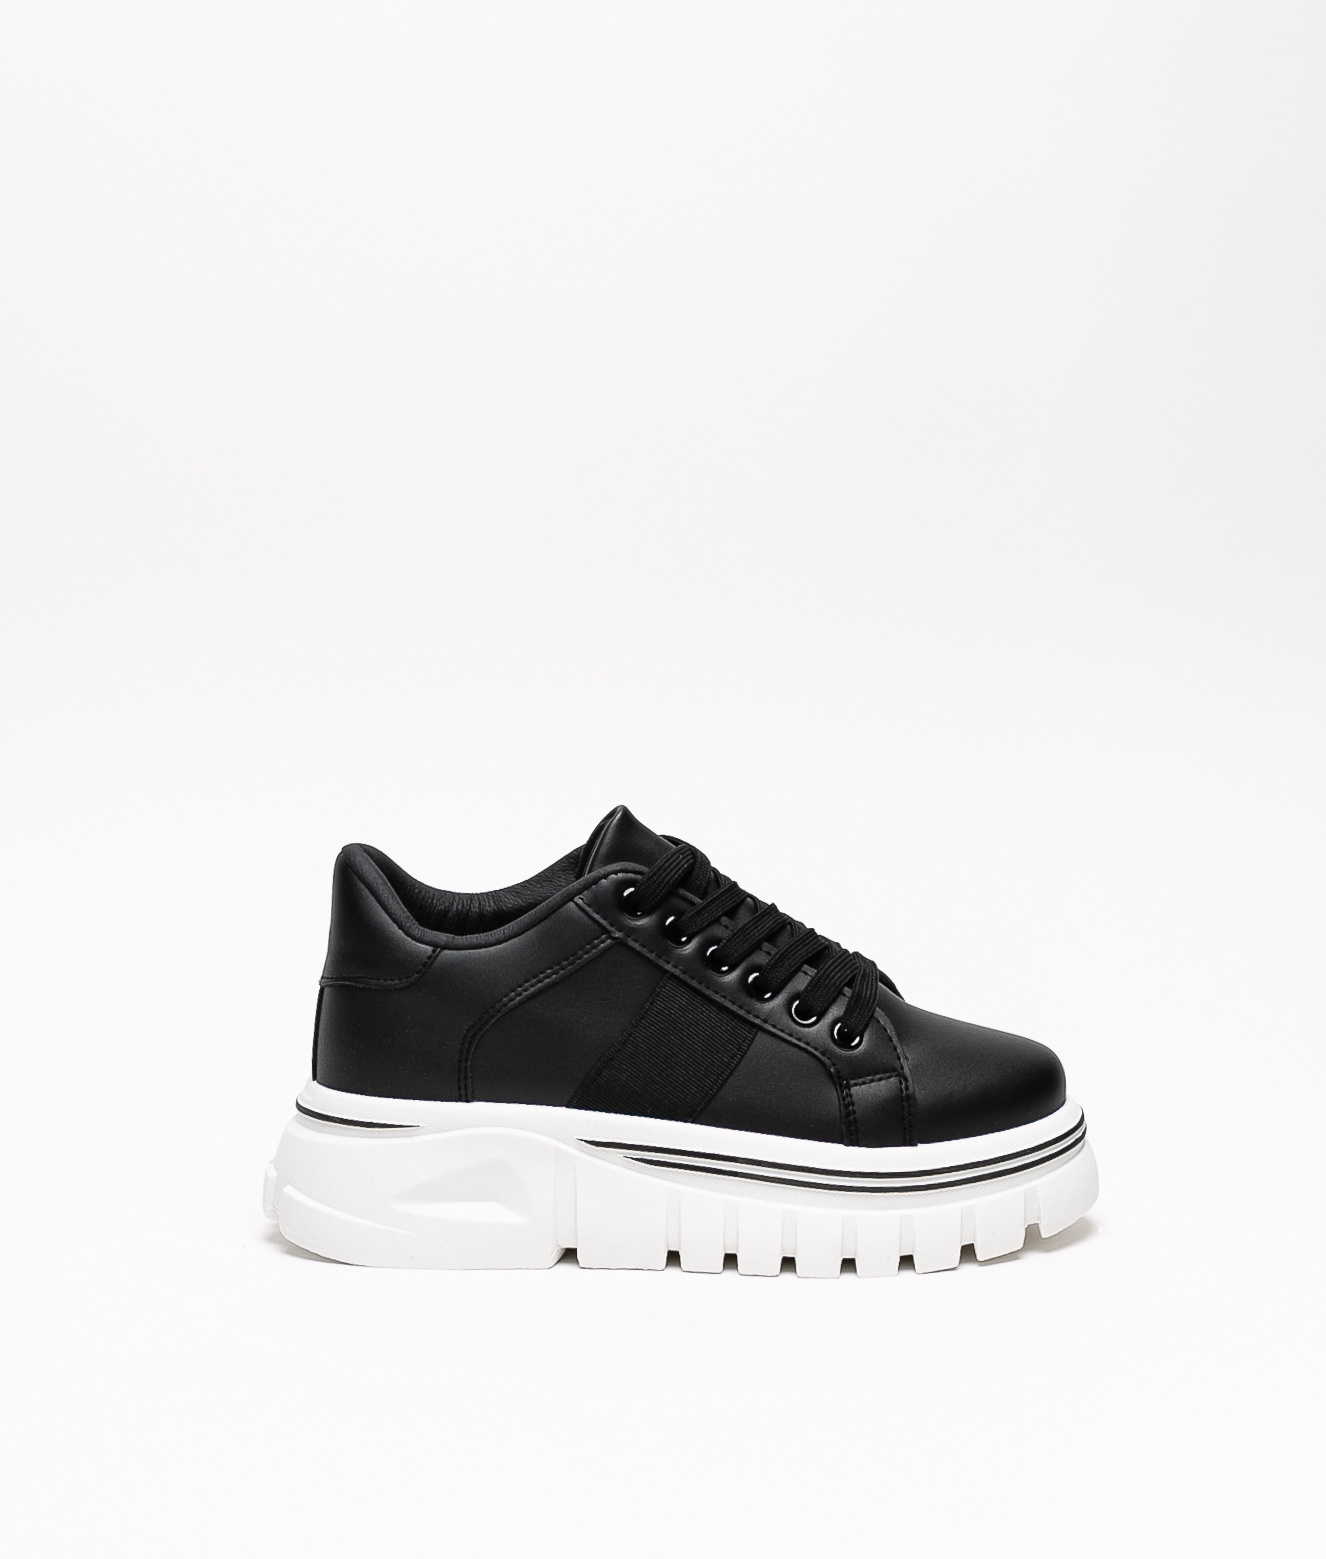 Sneakers Kreta - Nero